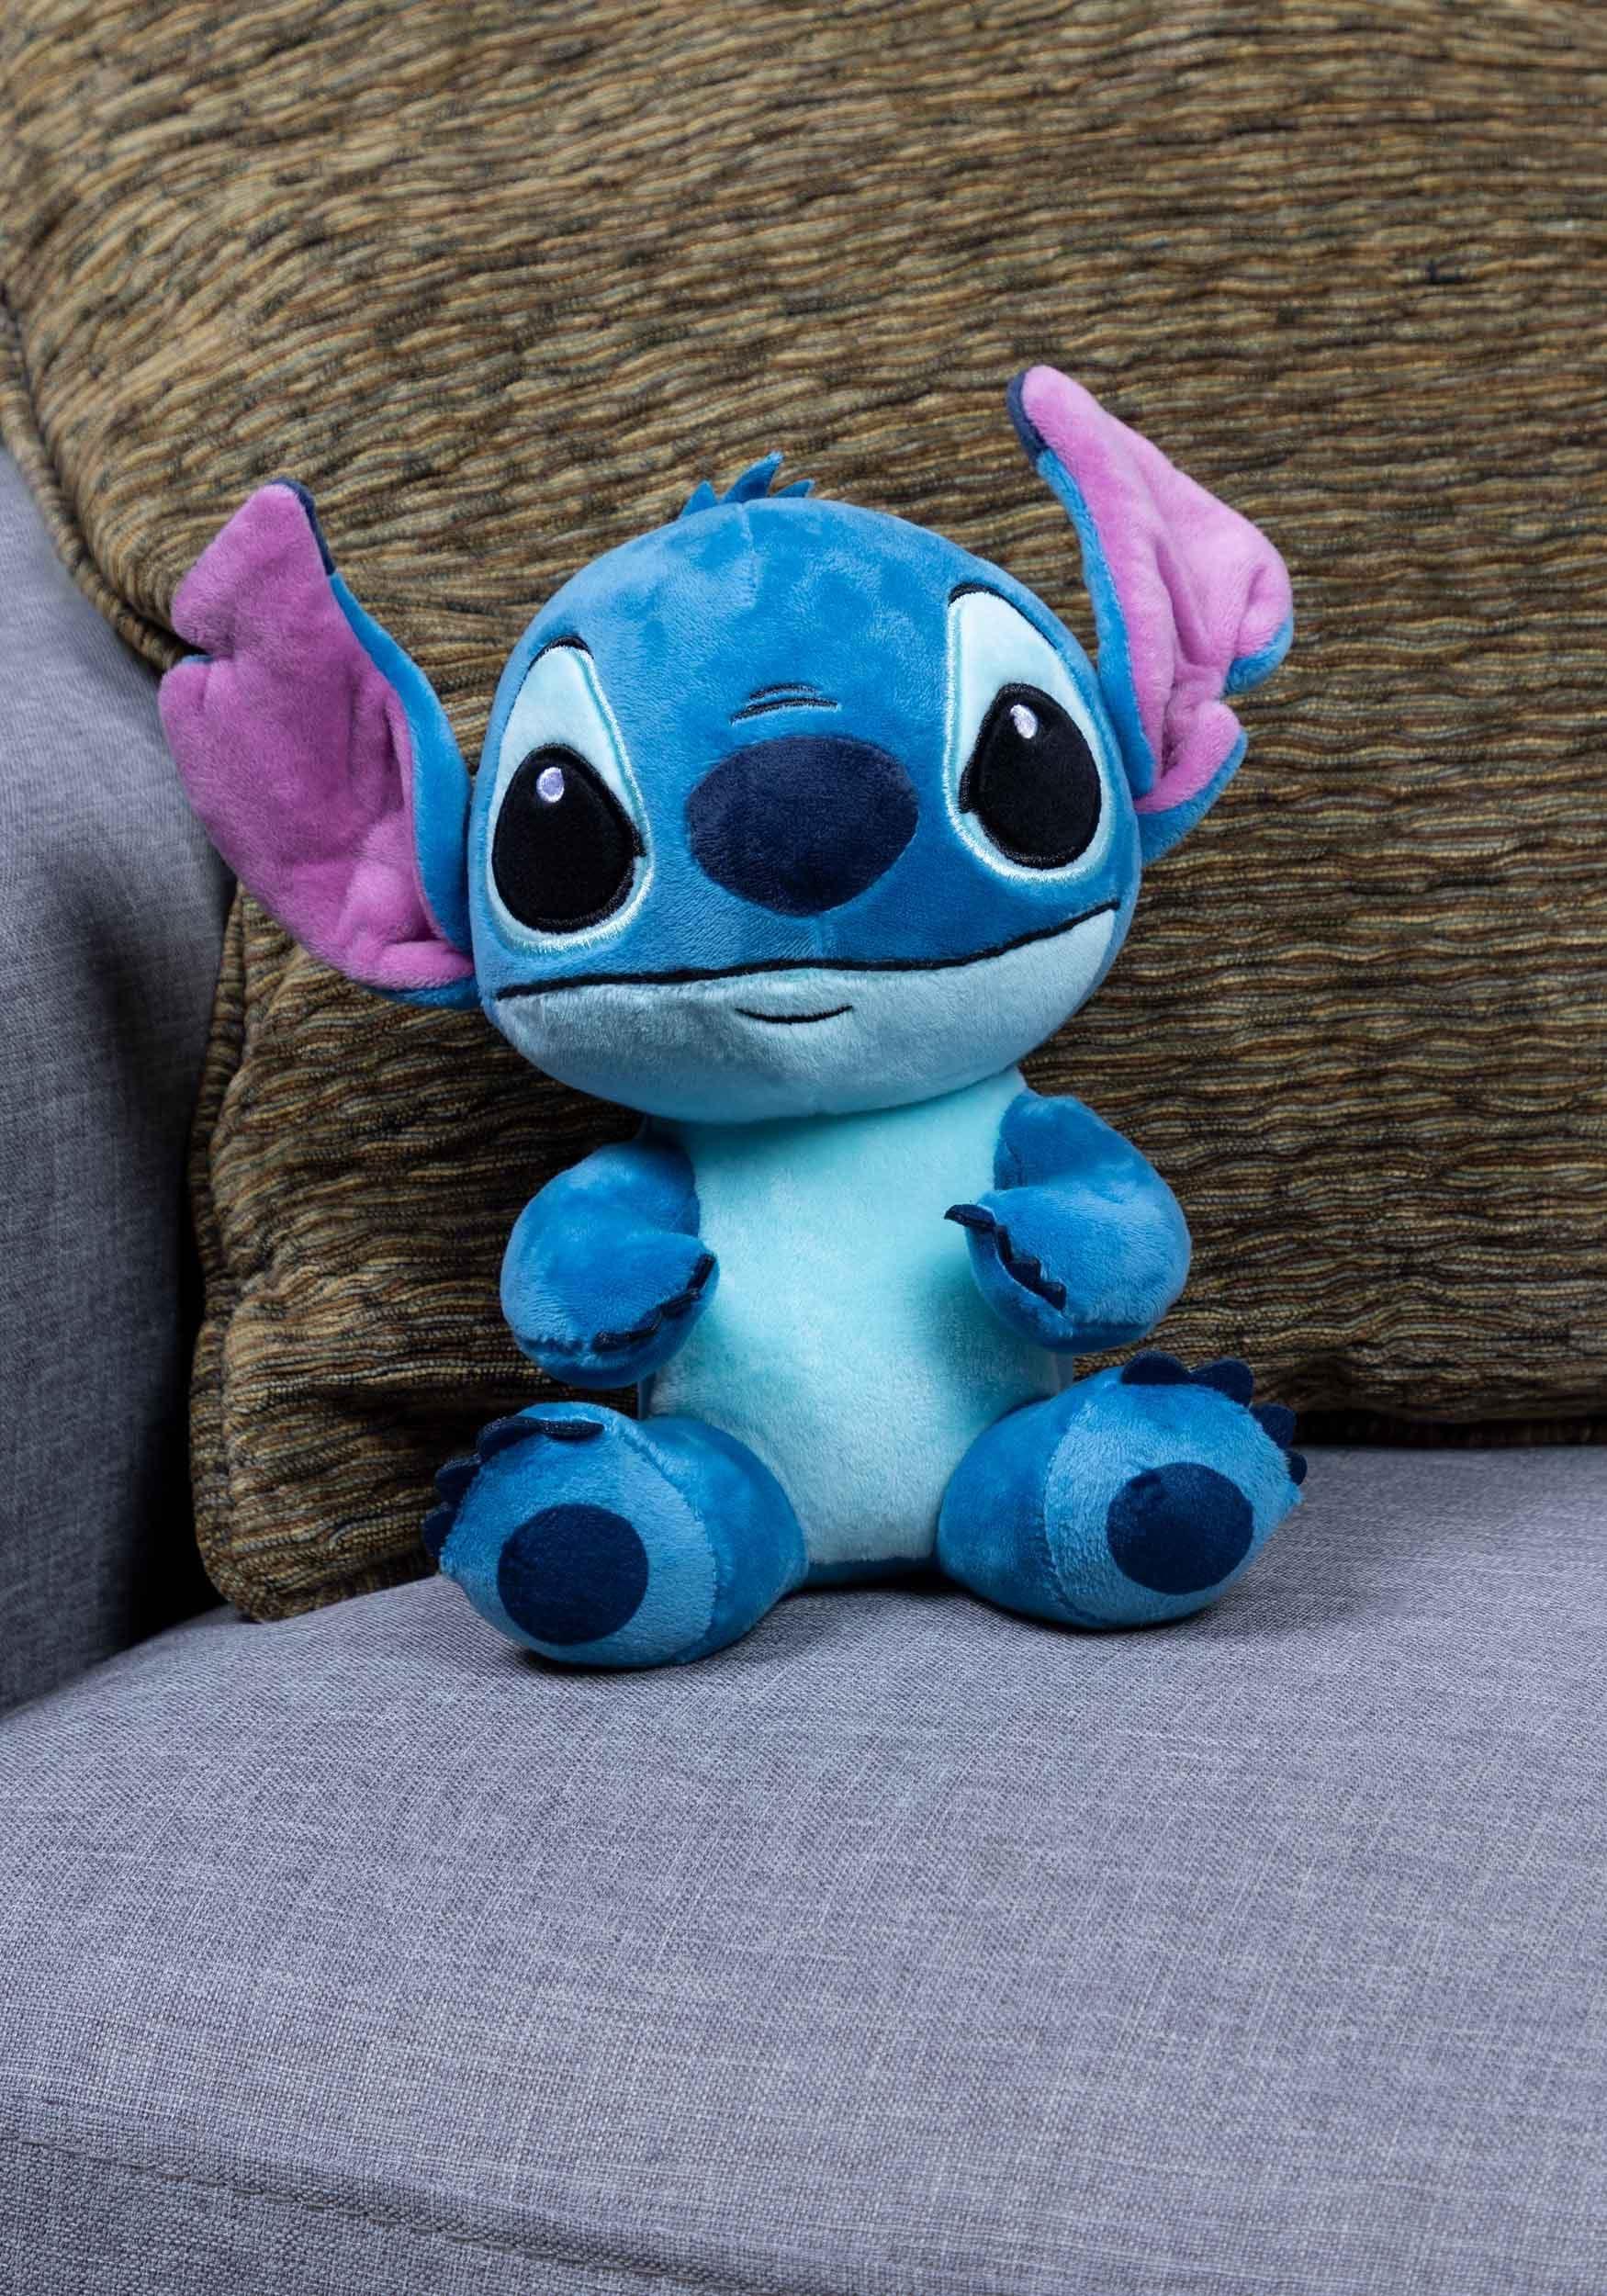 Lilo & Stitch Disney Phunny Stuffed Figure